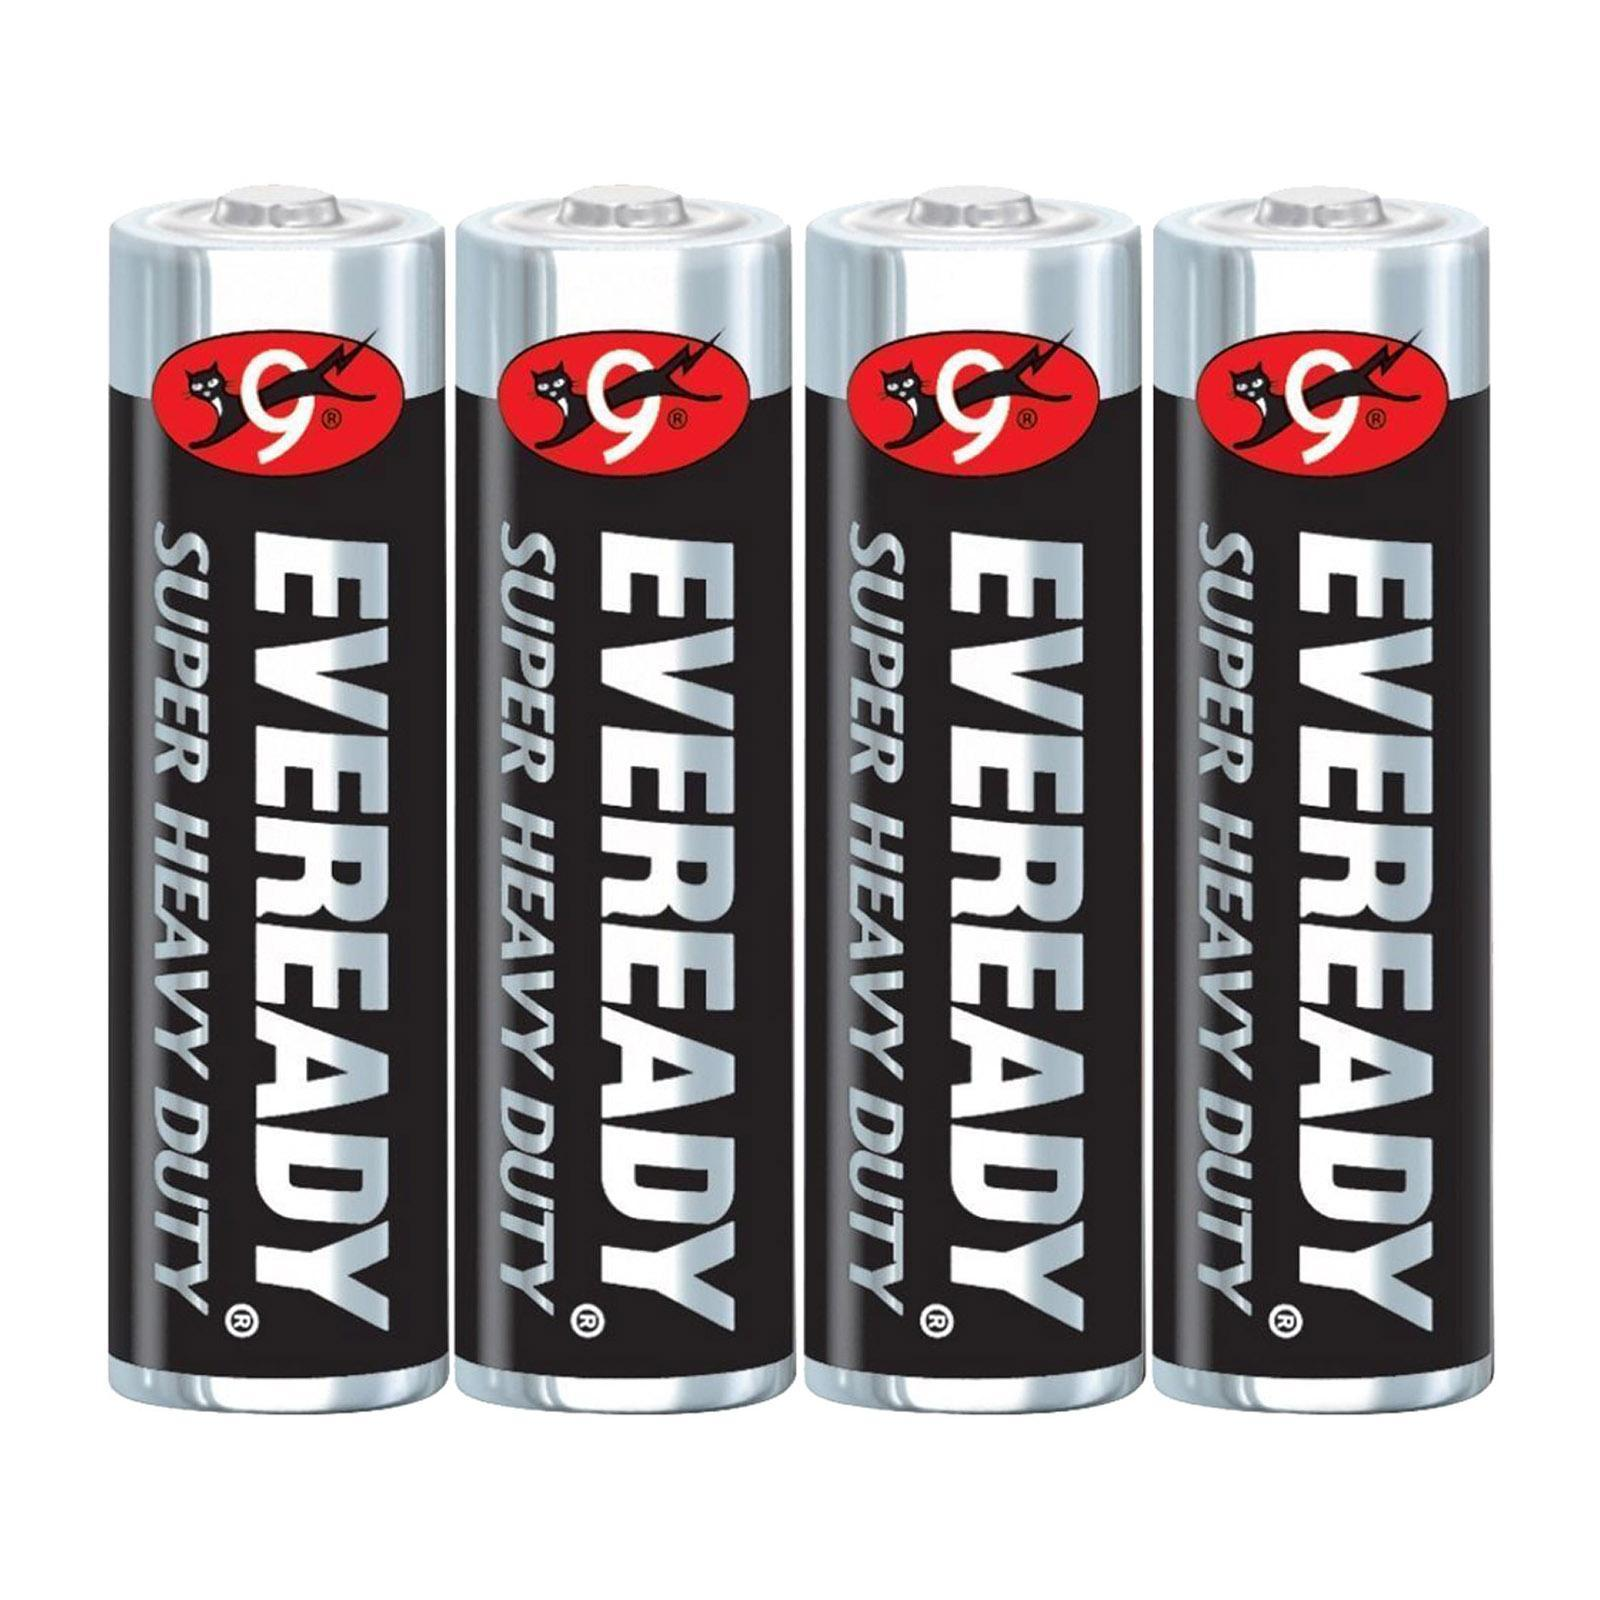 Eveready M1215 Sw4 Carbon Zinc Battery Super Heavy Duty Size:Aa (4Pcs/Pack)